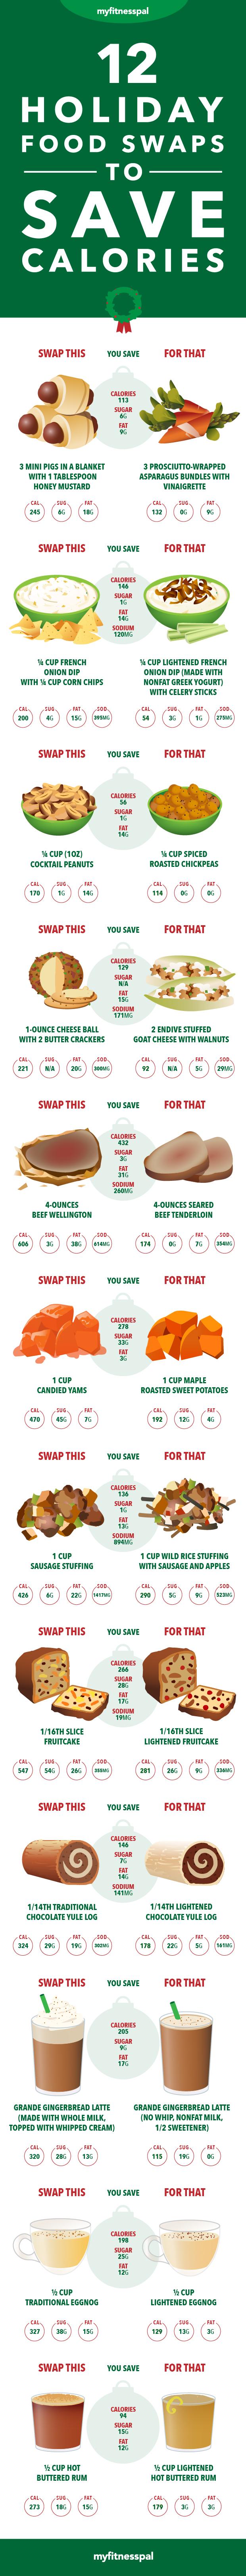 Holiday Food Swaps